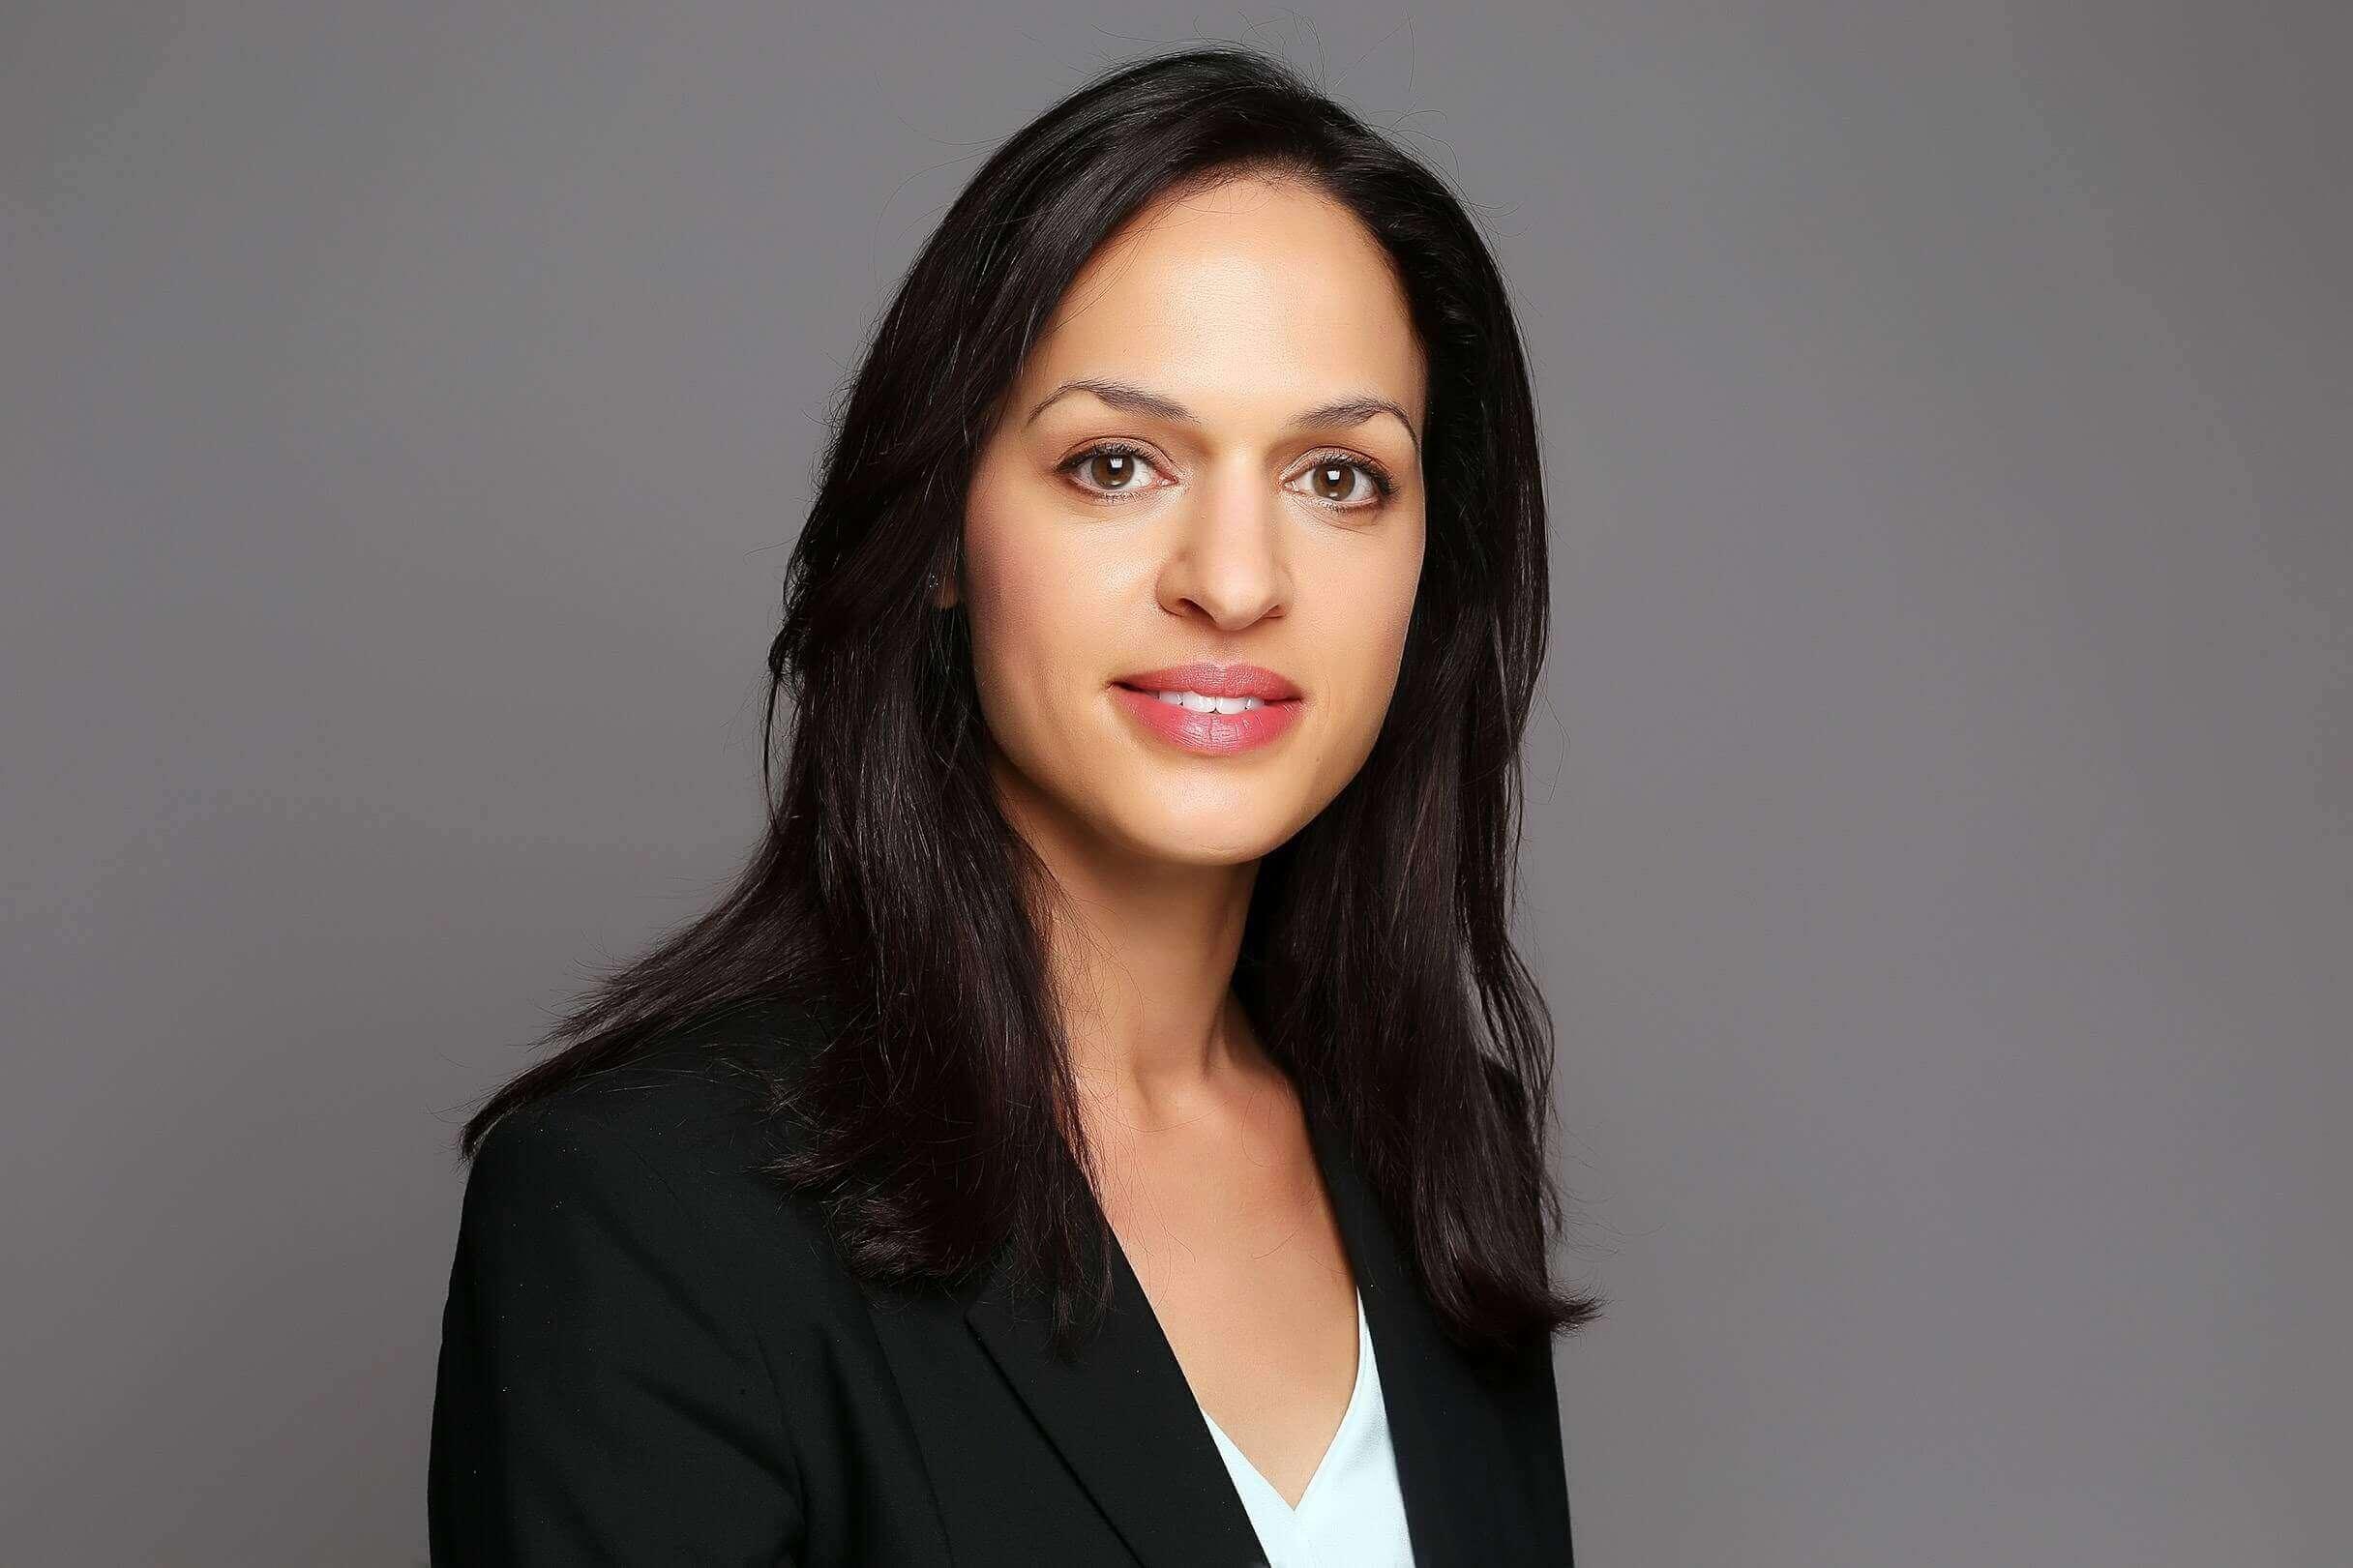 Interactio welcomes a new UN Team Leader - Asma Dakhouche